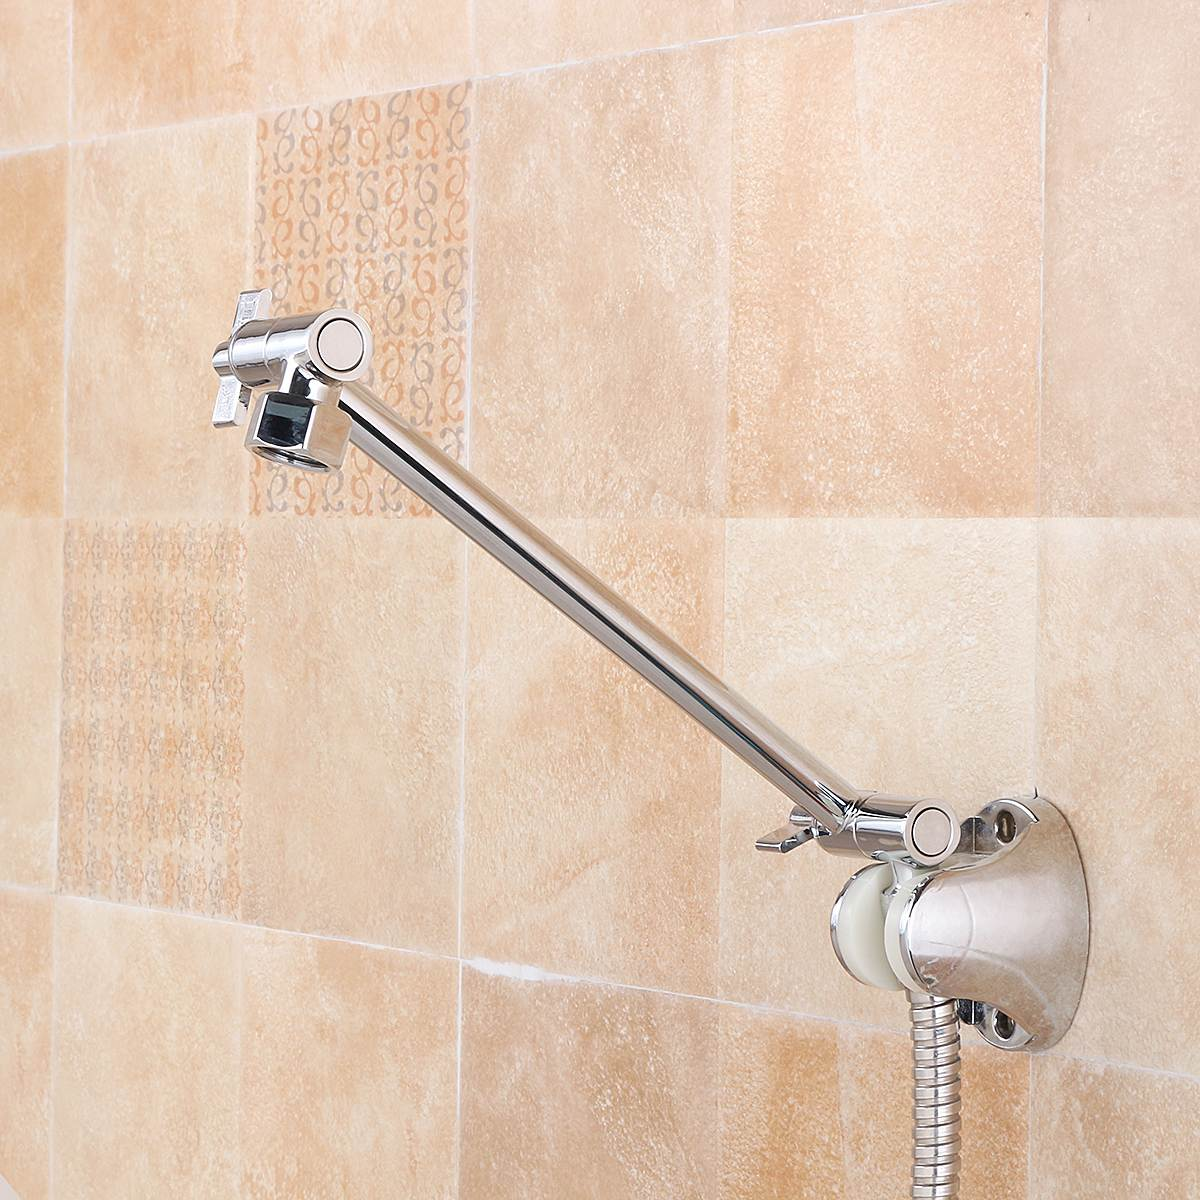 9 Inch Brass Chrome Shower Head Adjustable Height Arm Wall